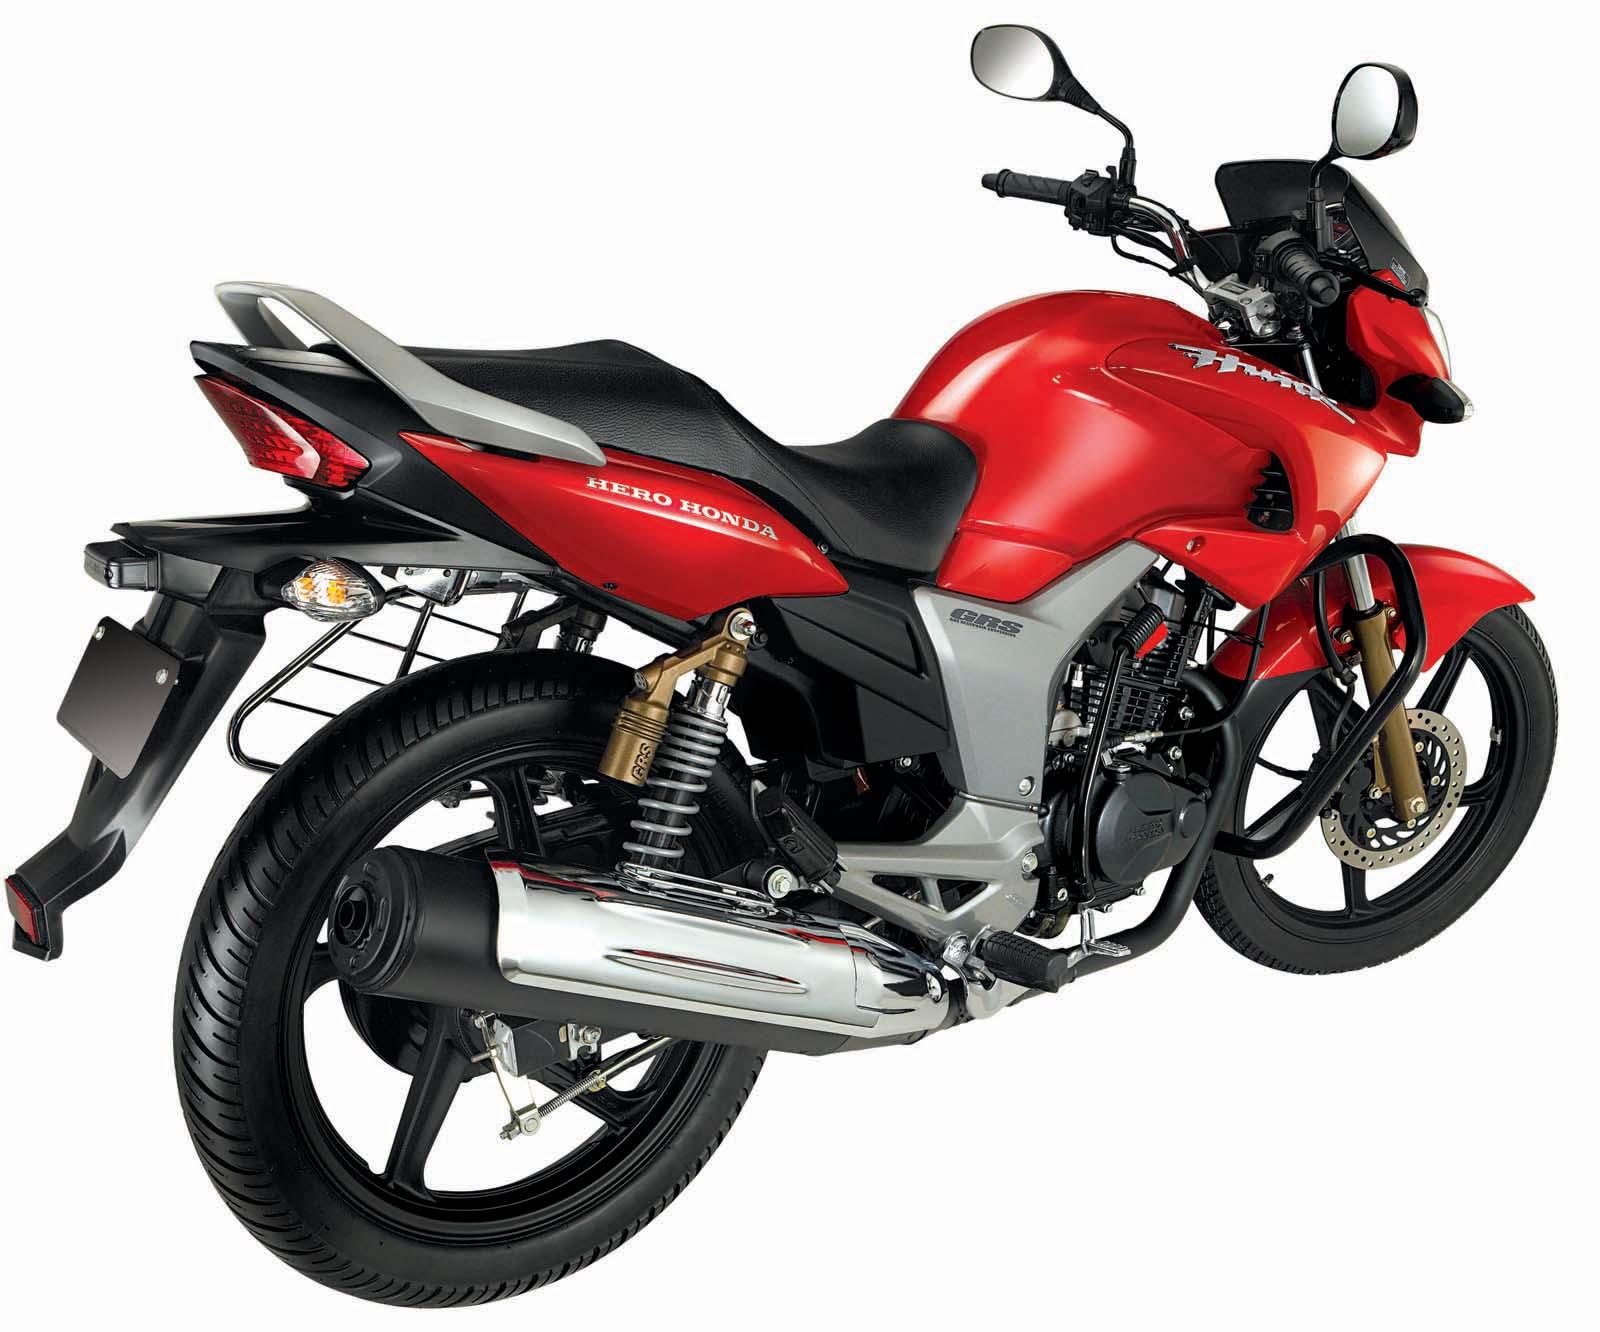 Hunk Bike New Model 2019 Price In India Roblox Redeem Codes 2019